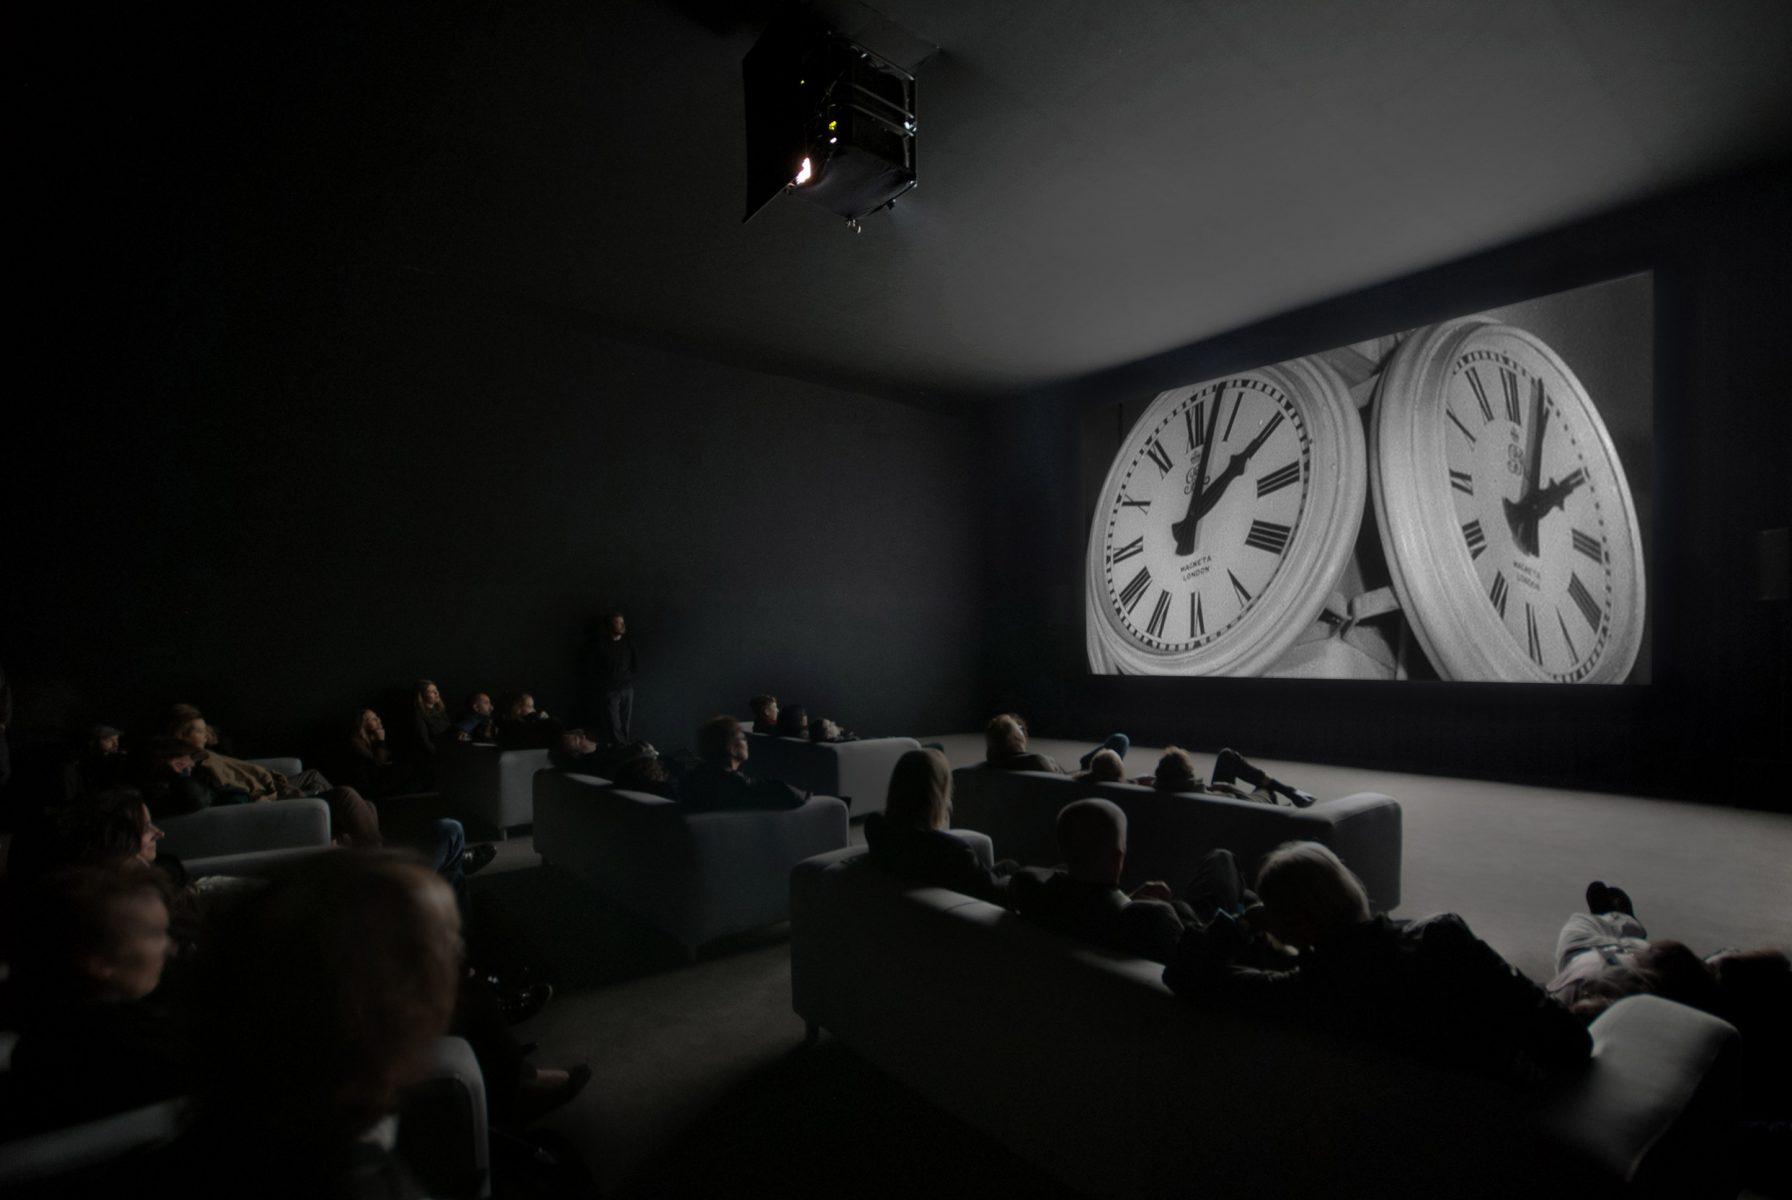 Christian-Marclay-The-Clock-2010-a3-copiemodif1-1792×1200